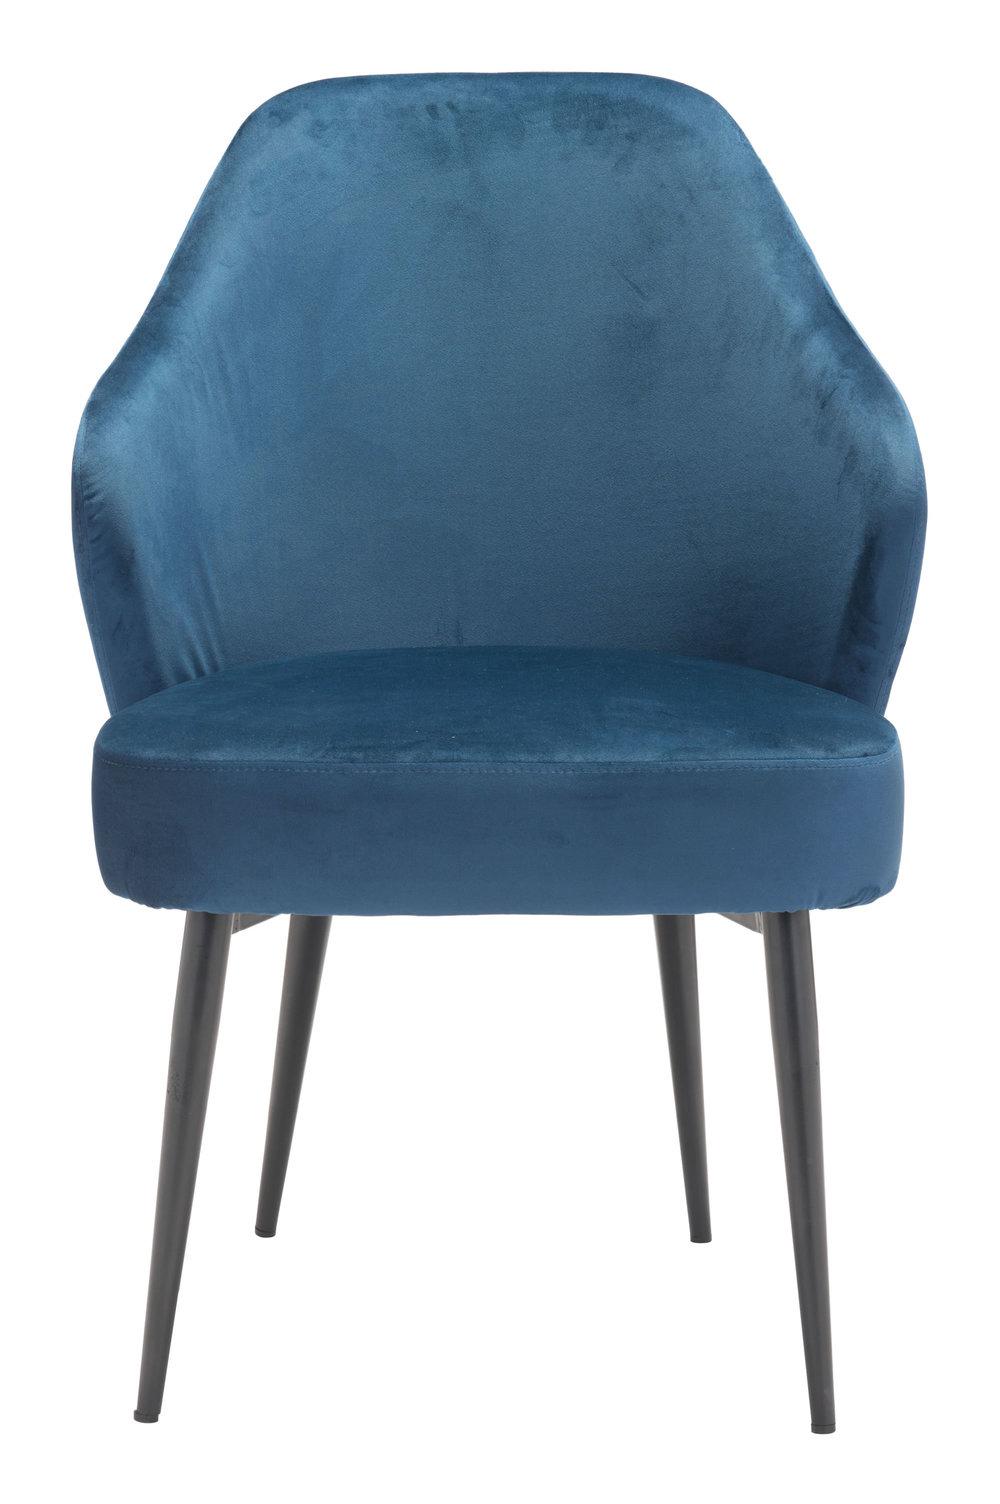 Zuo Modern Contemporary - Savon Dining Chair Navy